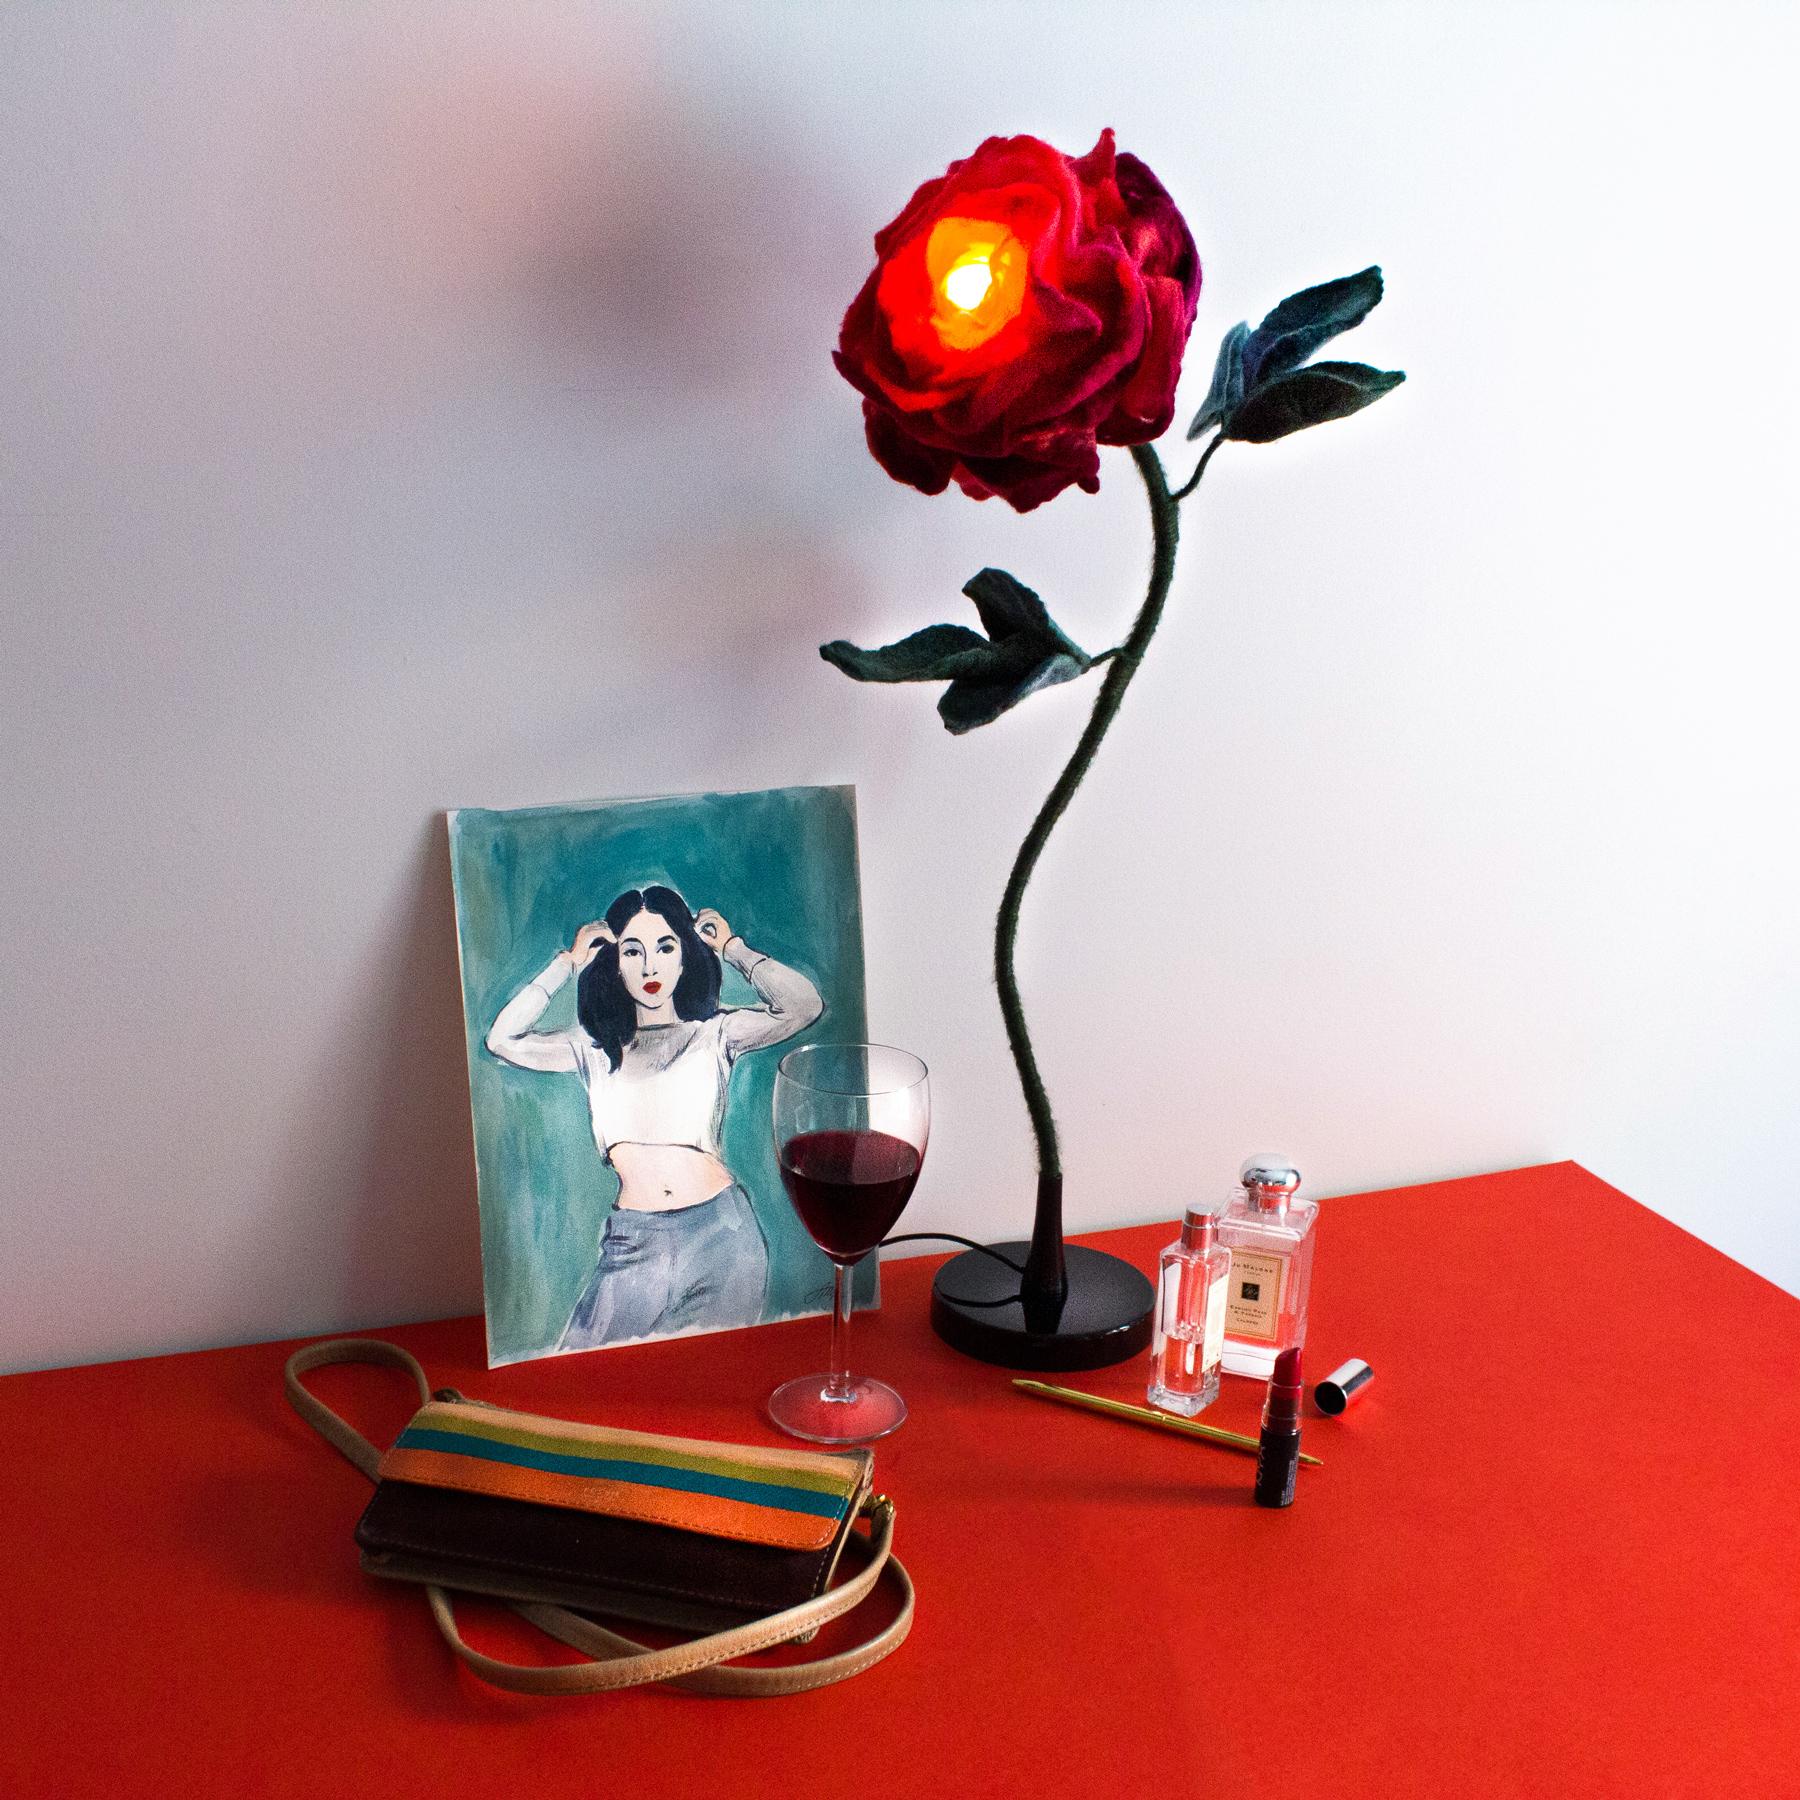 felt-flower-lamp_Cherry-Rose_Adelya-Tumasyeva_1.jpg